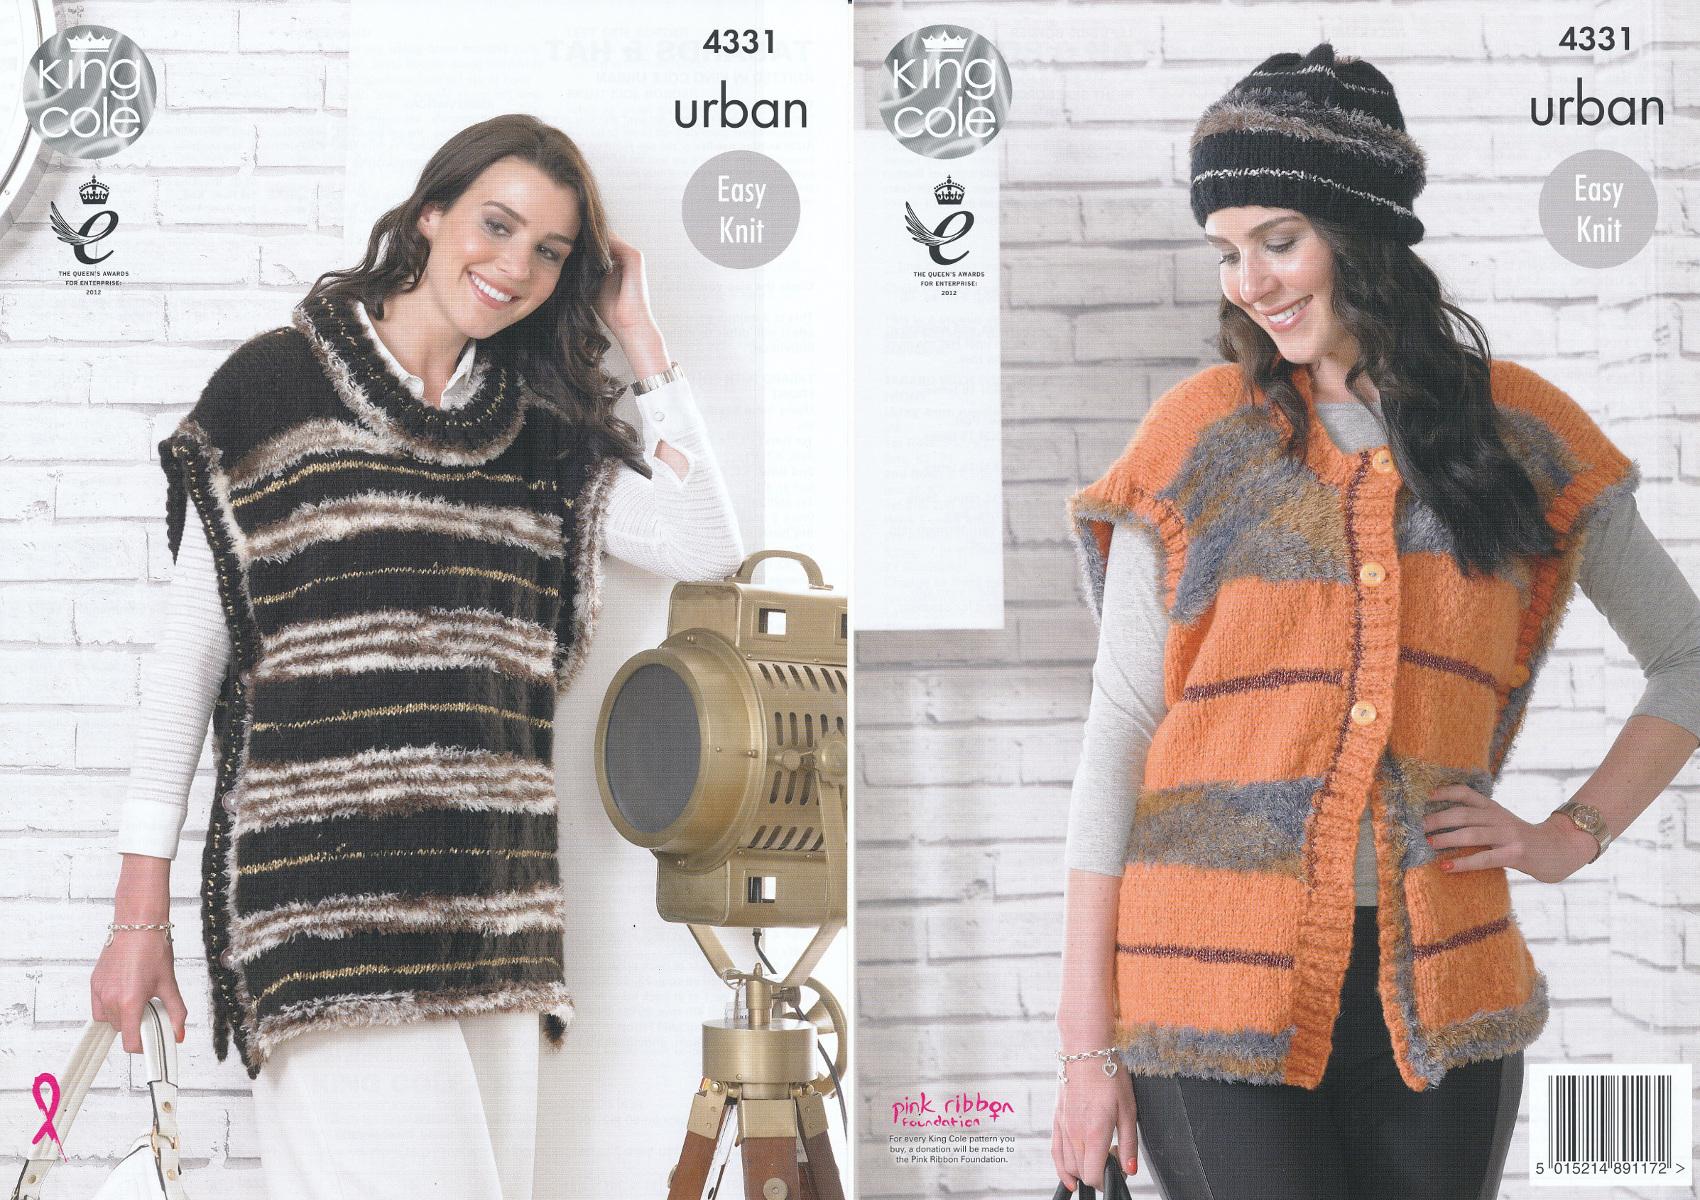 2488826f5477b5 King Cole Urban Knitting Pattern Ladies Easy Knit Cap Sleeve Tabards   Hat  4331